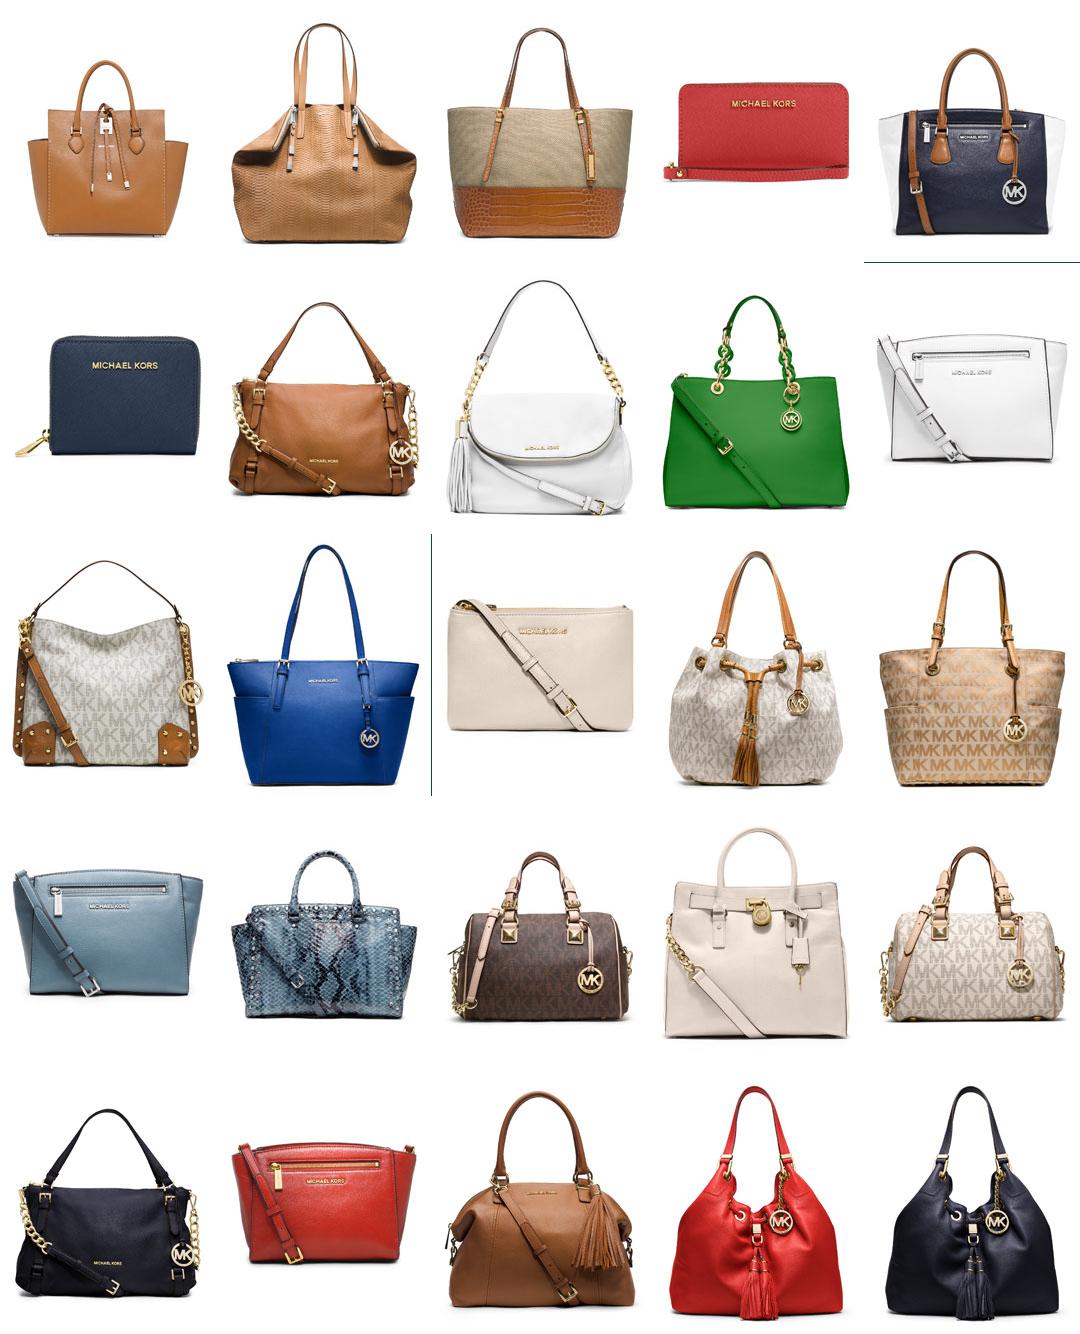 6e6ed8f1 Tradeguide24.com - Michael Kors handbag stock MOQ 1unit KORS